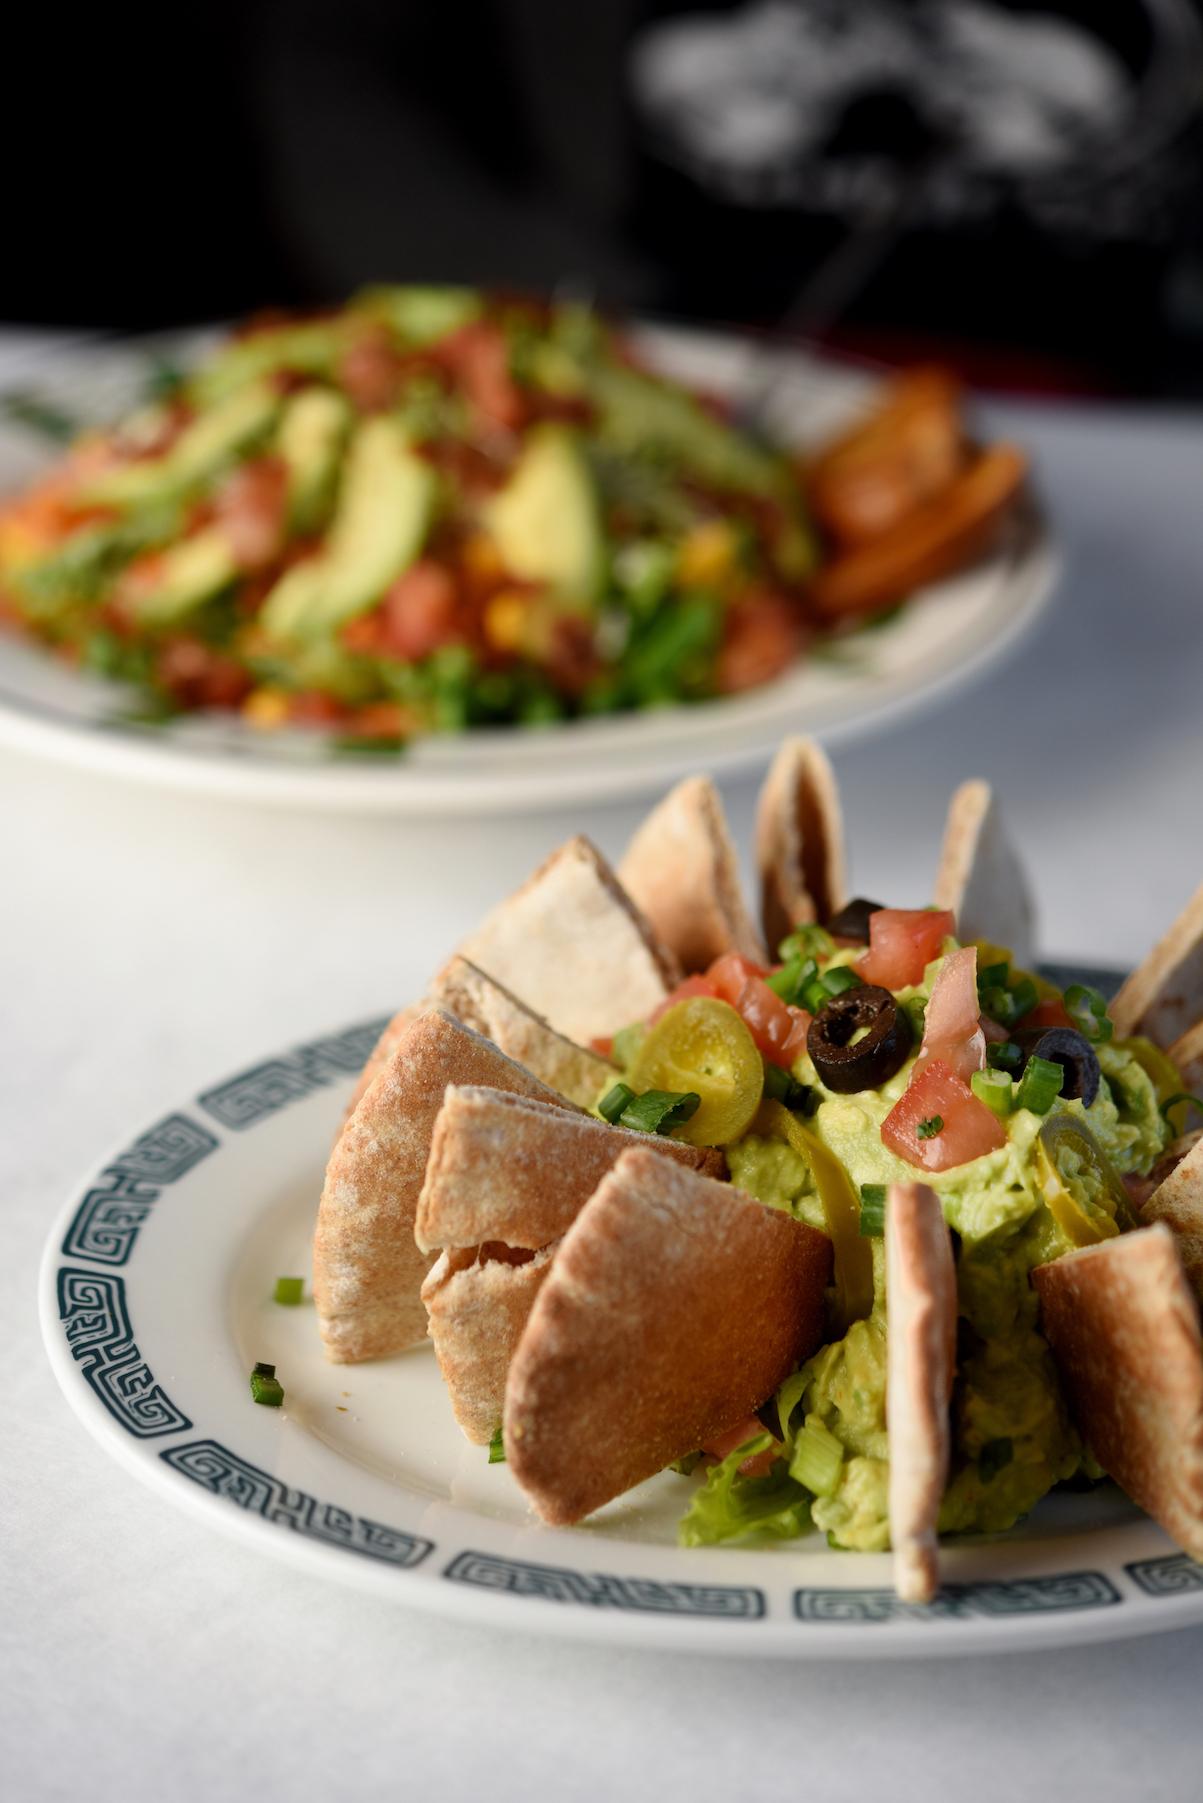 Magnolia Cafe's guacamole with pita